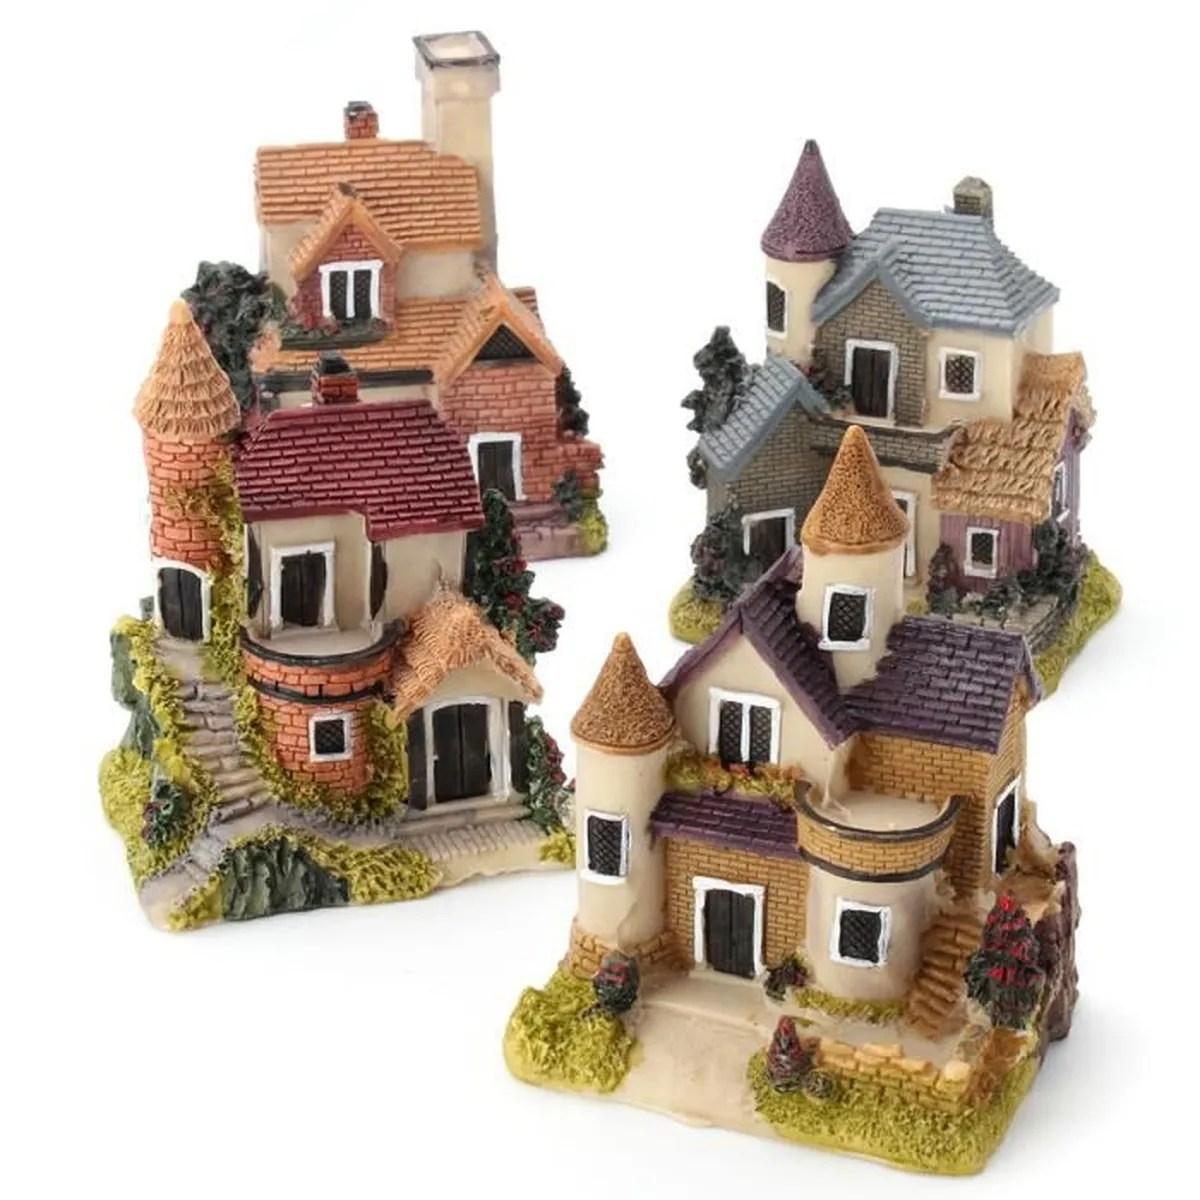 Ornement Rsine Dcoration Miniature Jardin Bonsa Maison Figurine  Achat  Vente statue